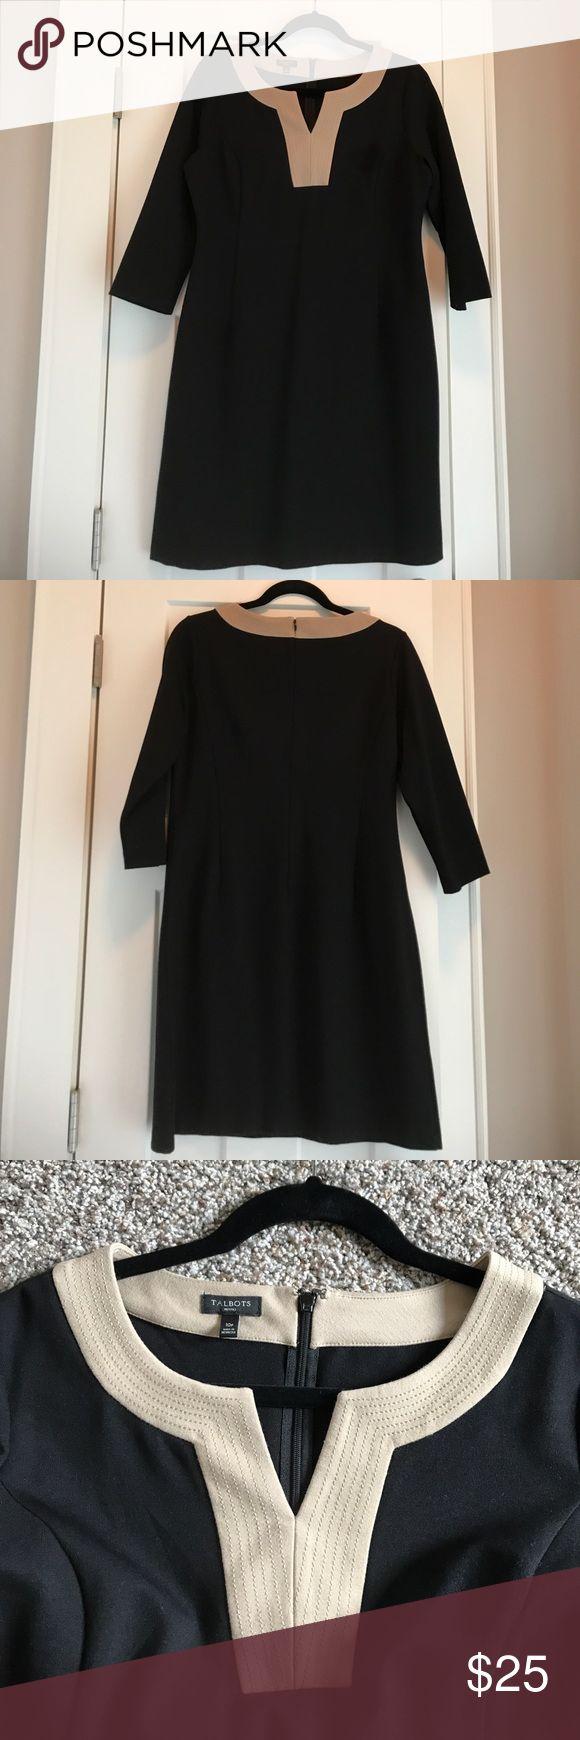 Talbots petite black dress Black and khaki dress with 3/4 sleeves. Thick material  62% Rayon 32% Nylon 5% Spandex. Zipper up the back. Talbots Dresses